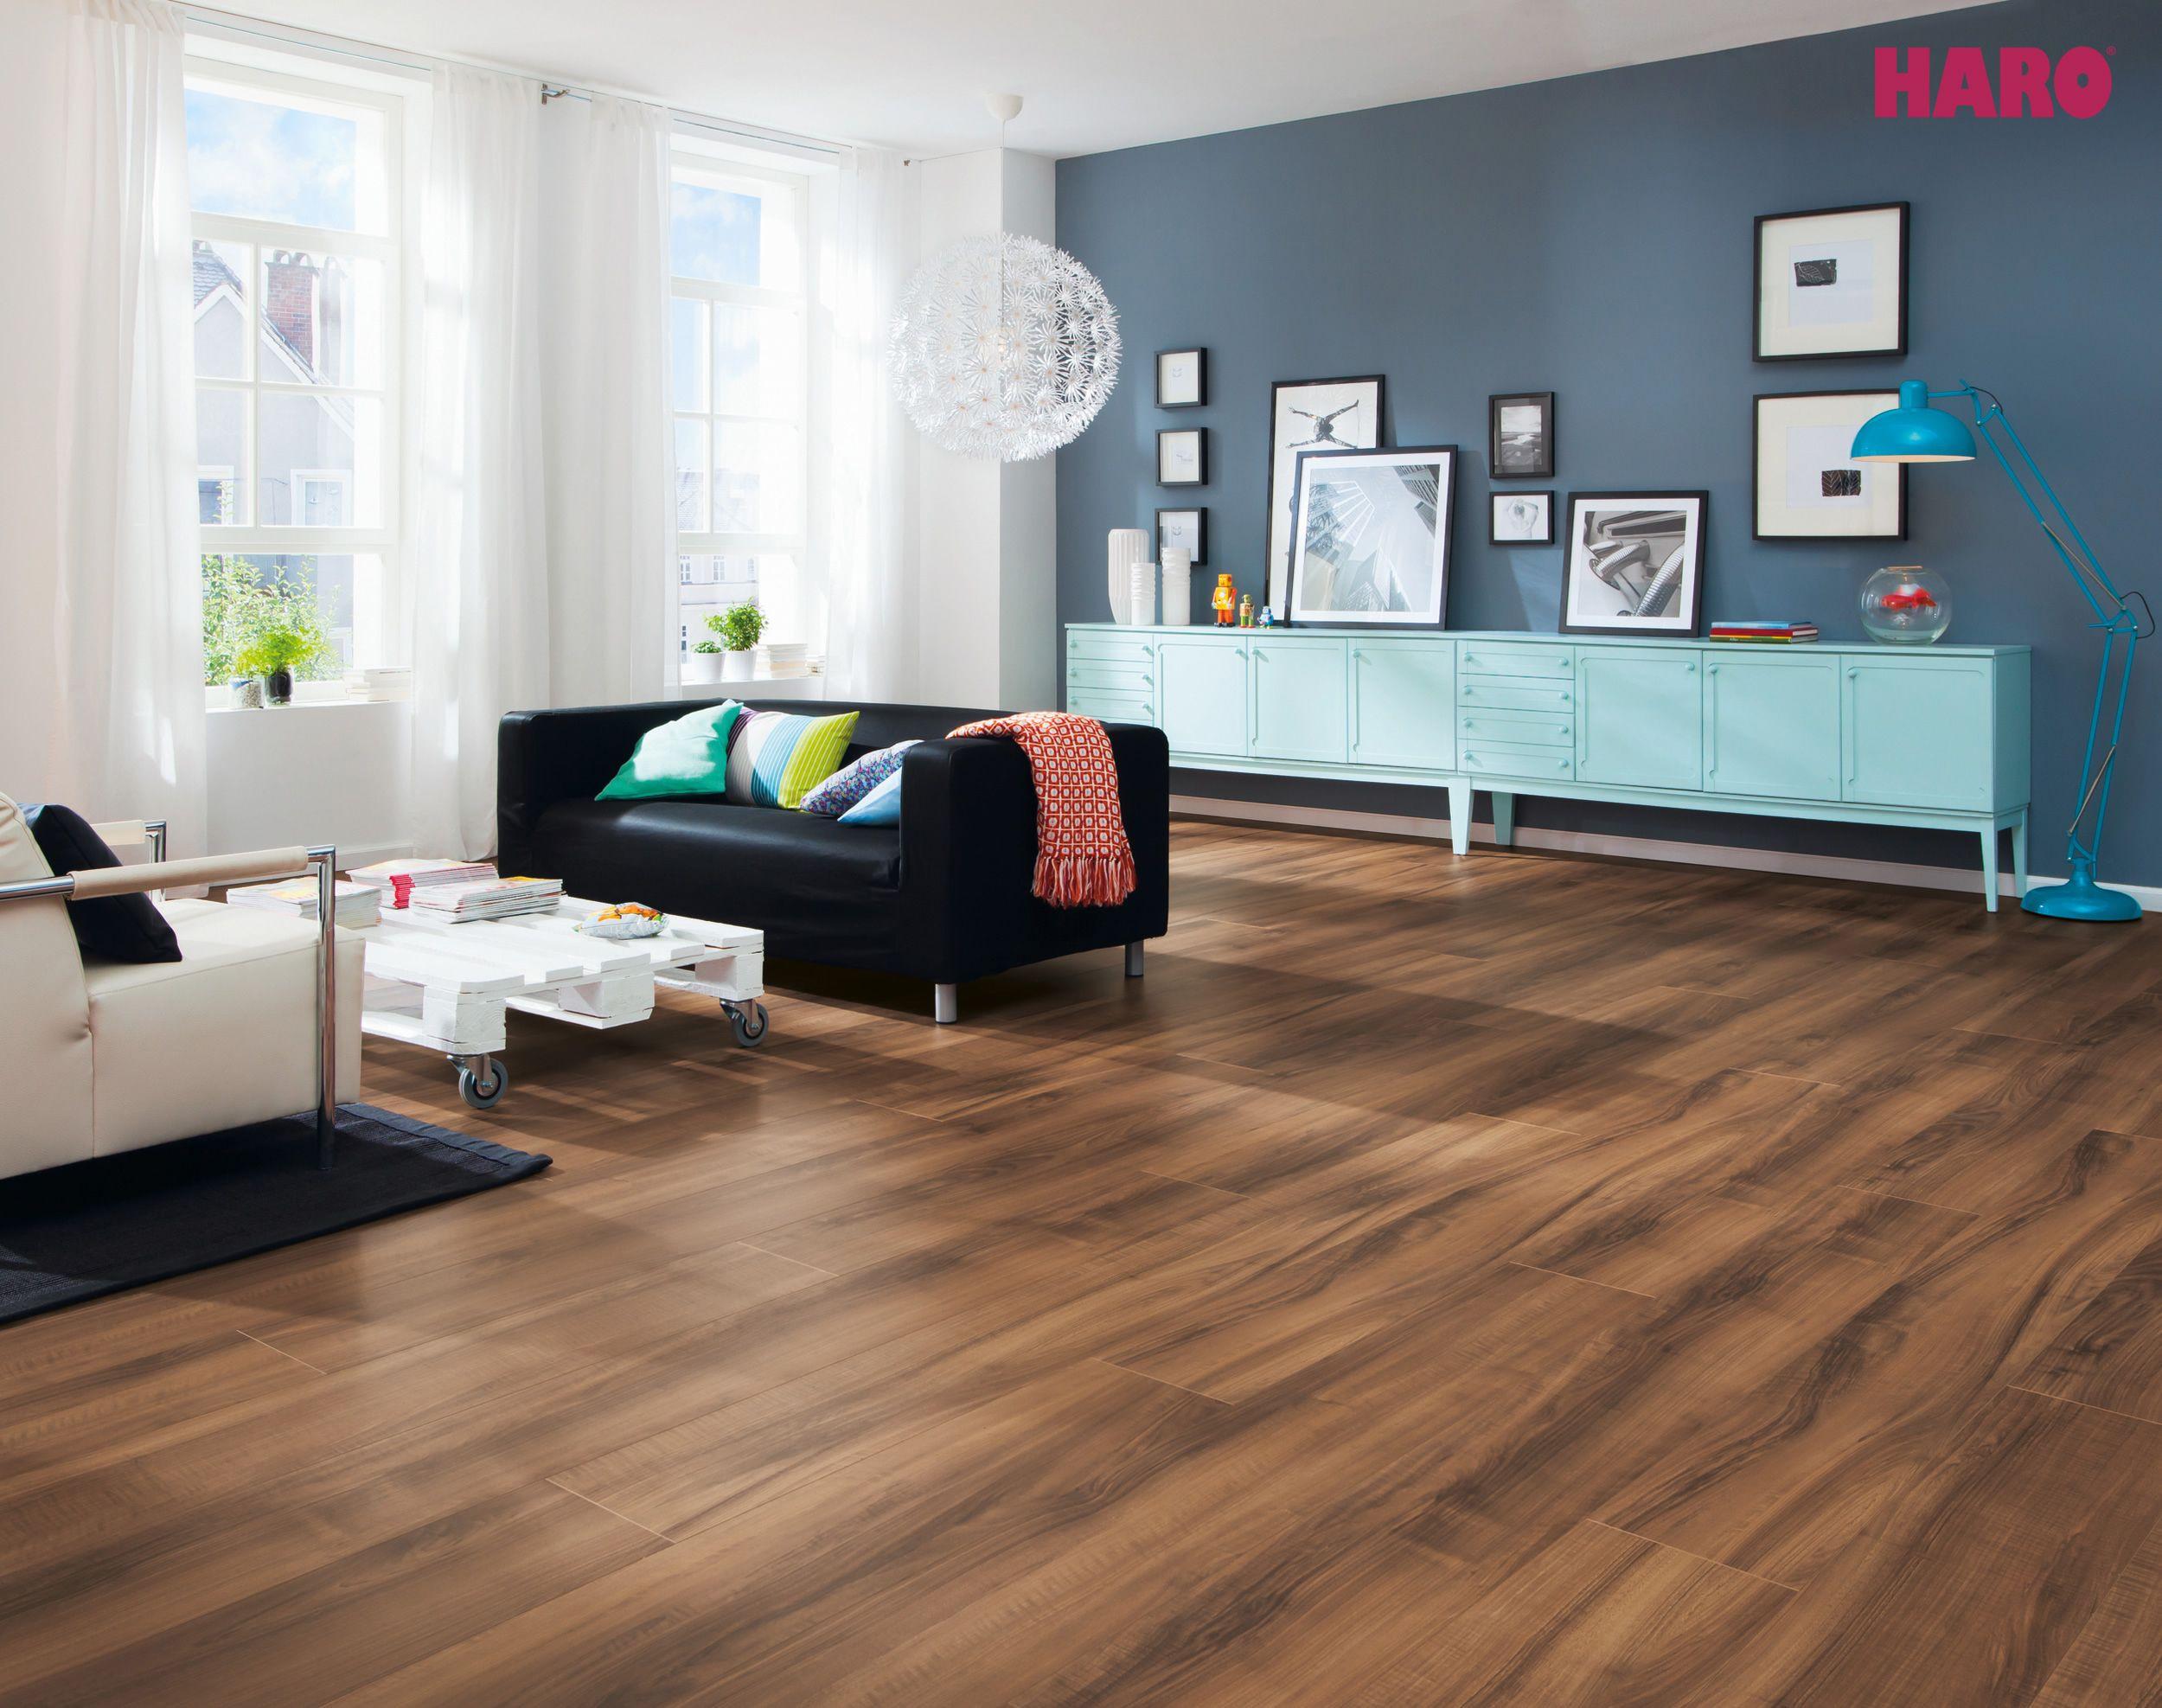 how to estimate hardwood floor installation of haro italian walnut tritty 100 gran via 4v 526 714 new house with haro italian walnut tritty 100 gran via 4v 526 714